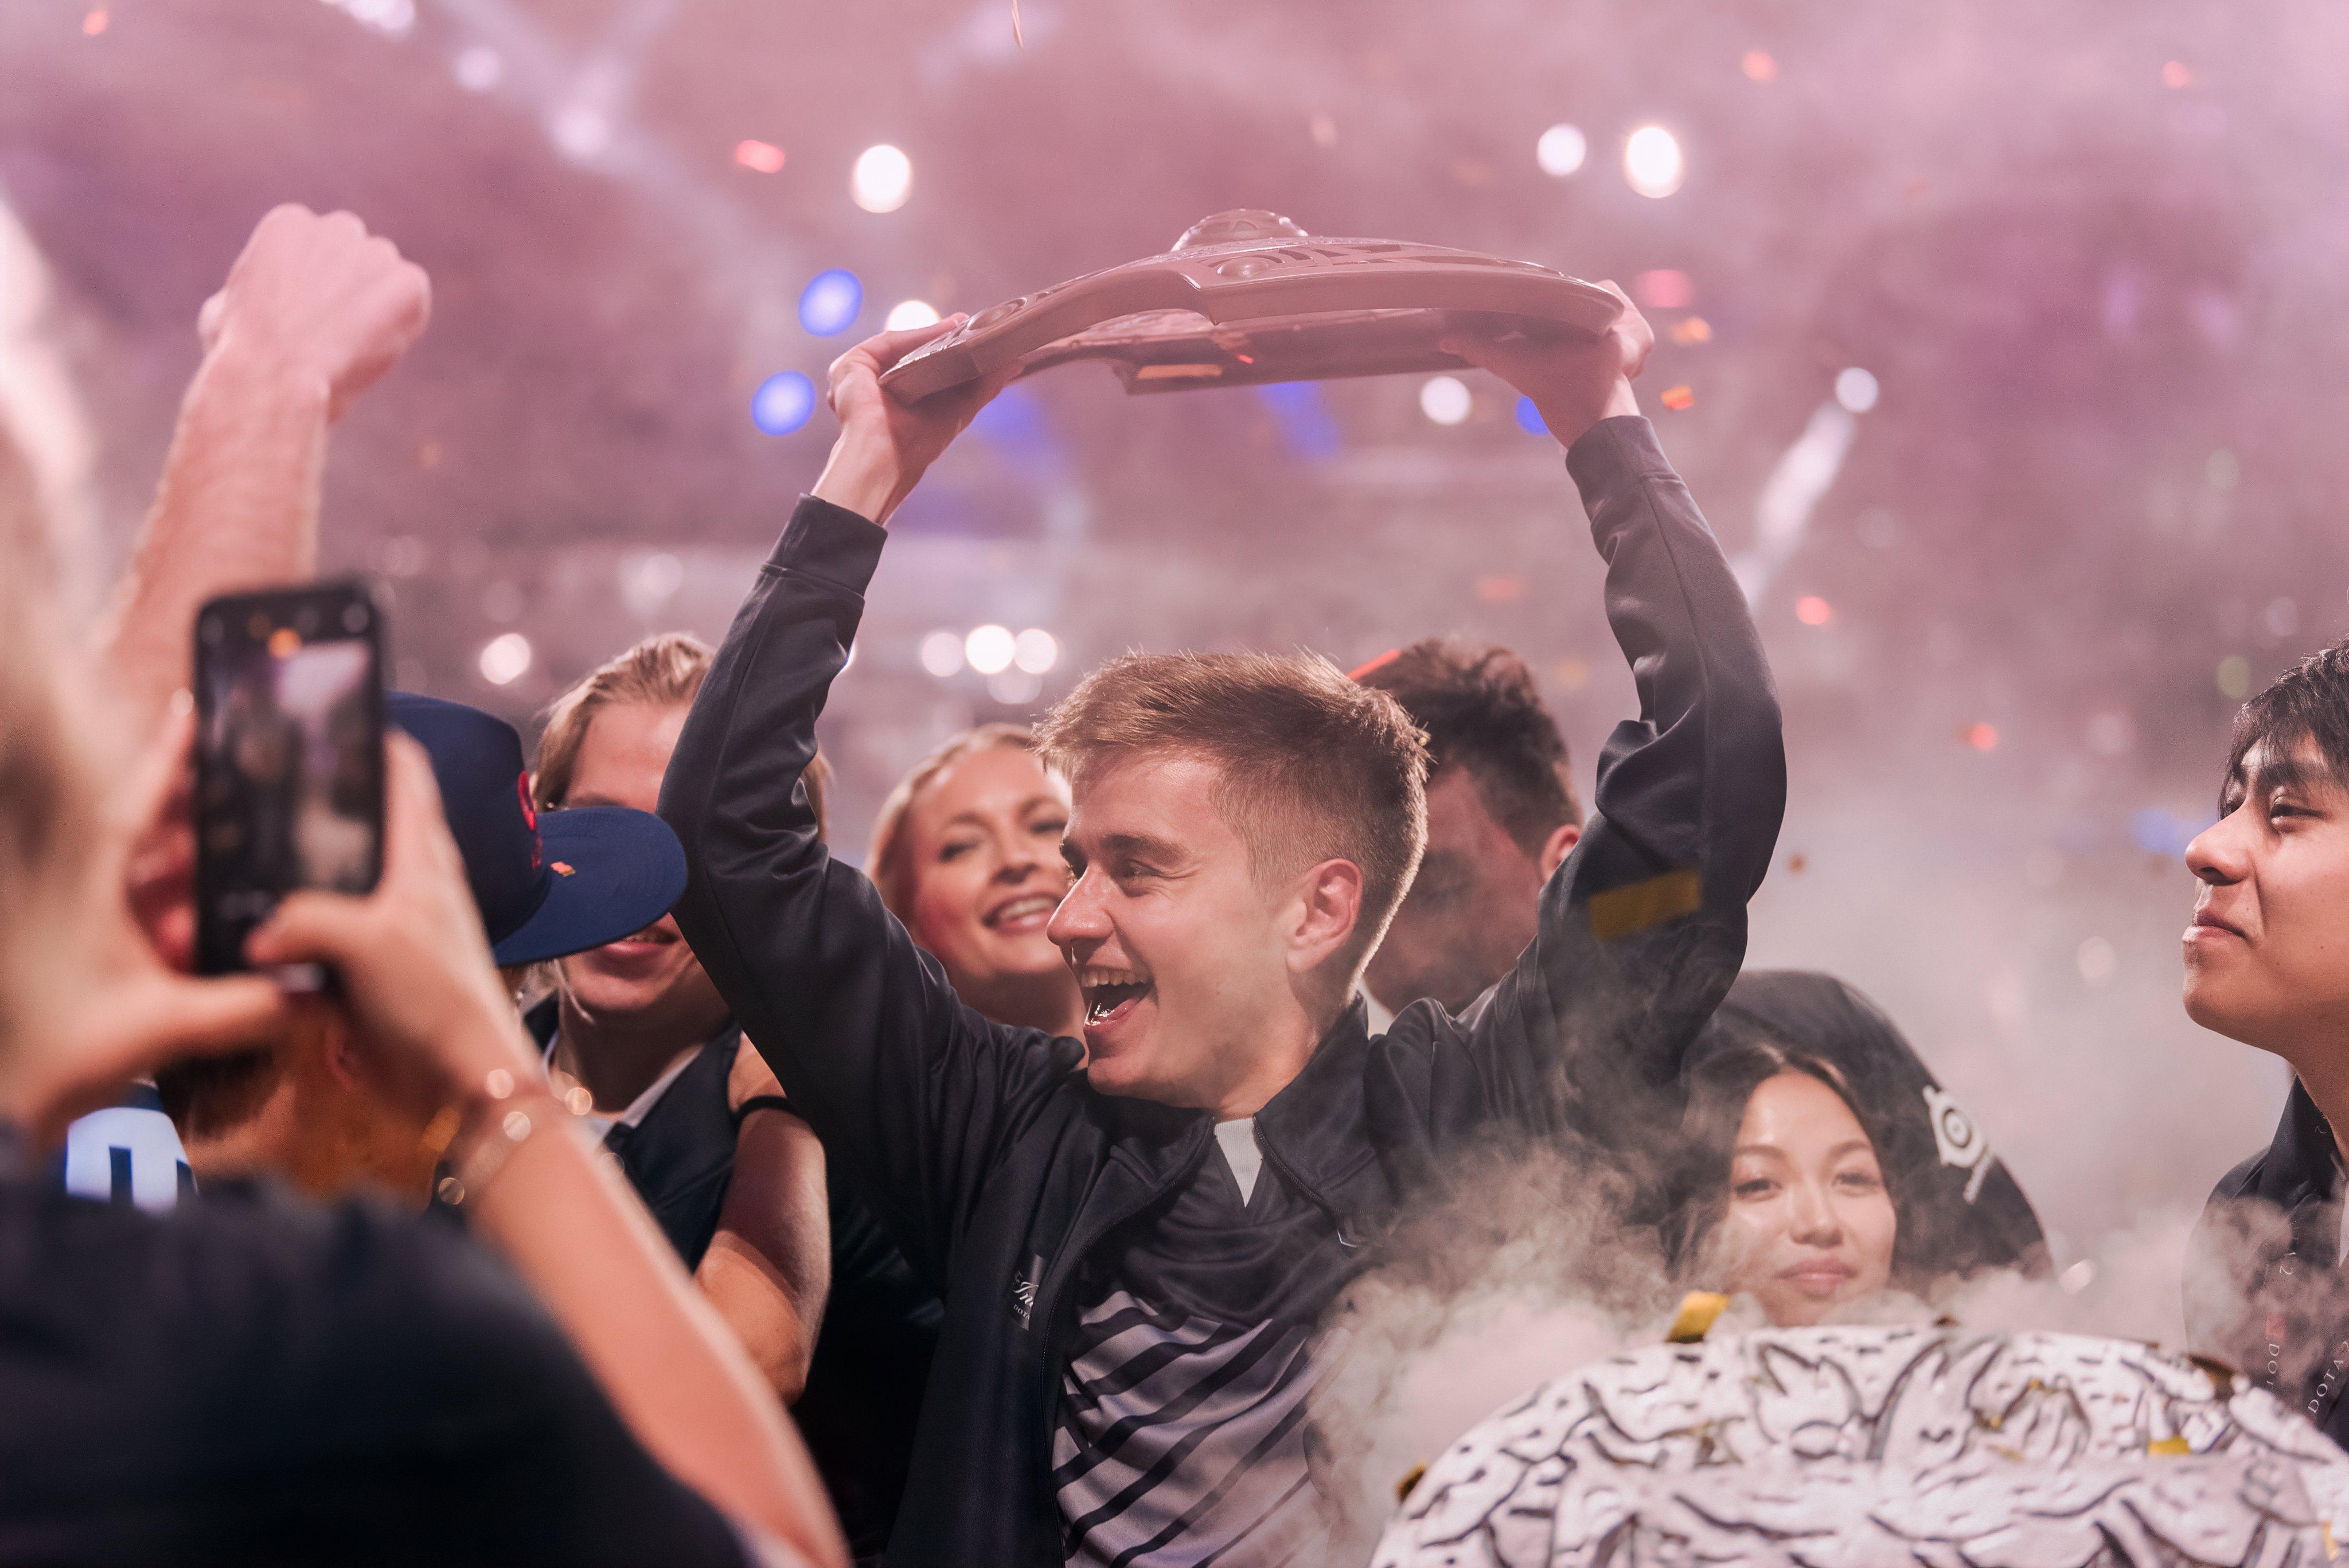 Dota 2. Команда OG победила в Гранд-финале The International 2019 - изображение 3